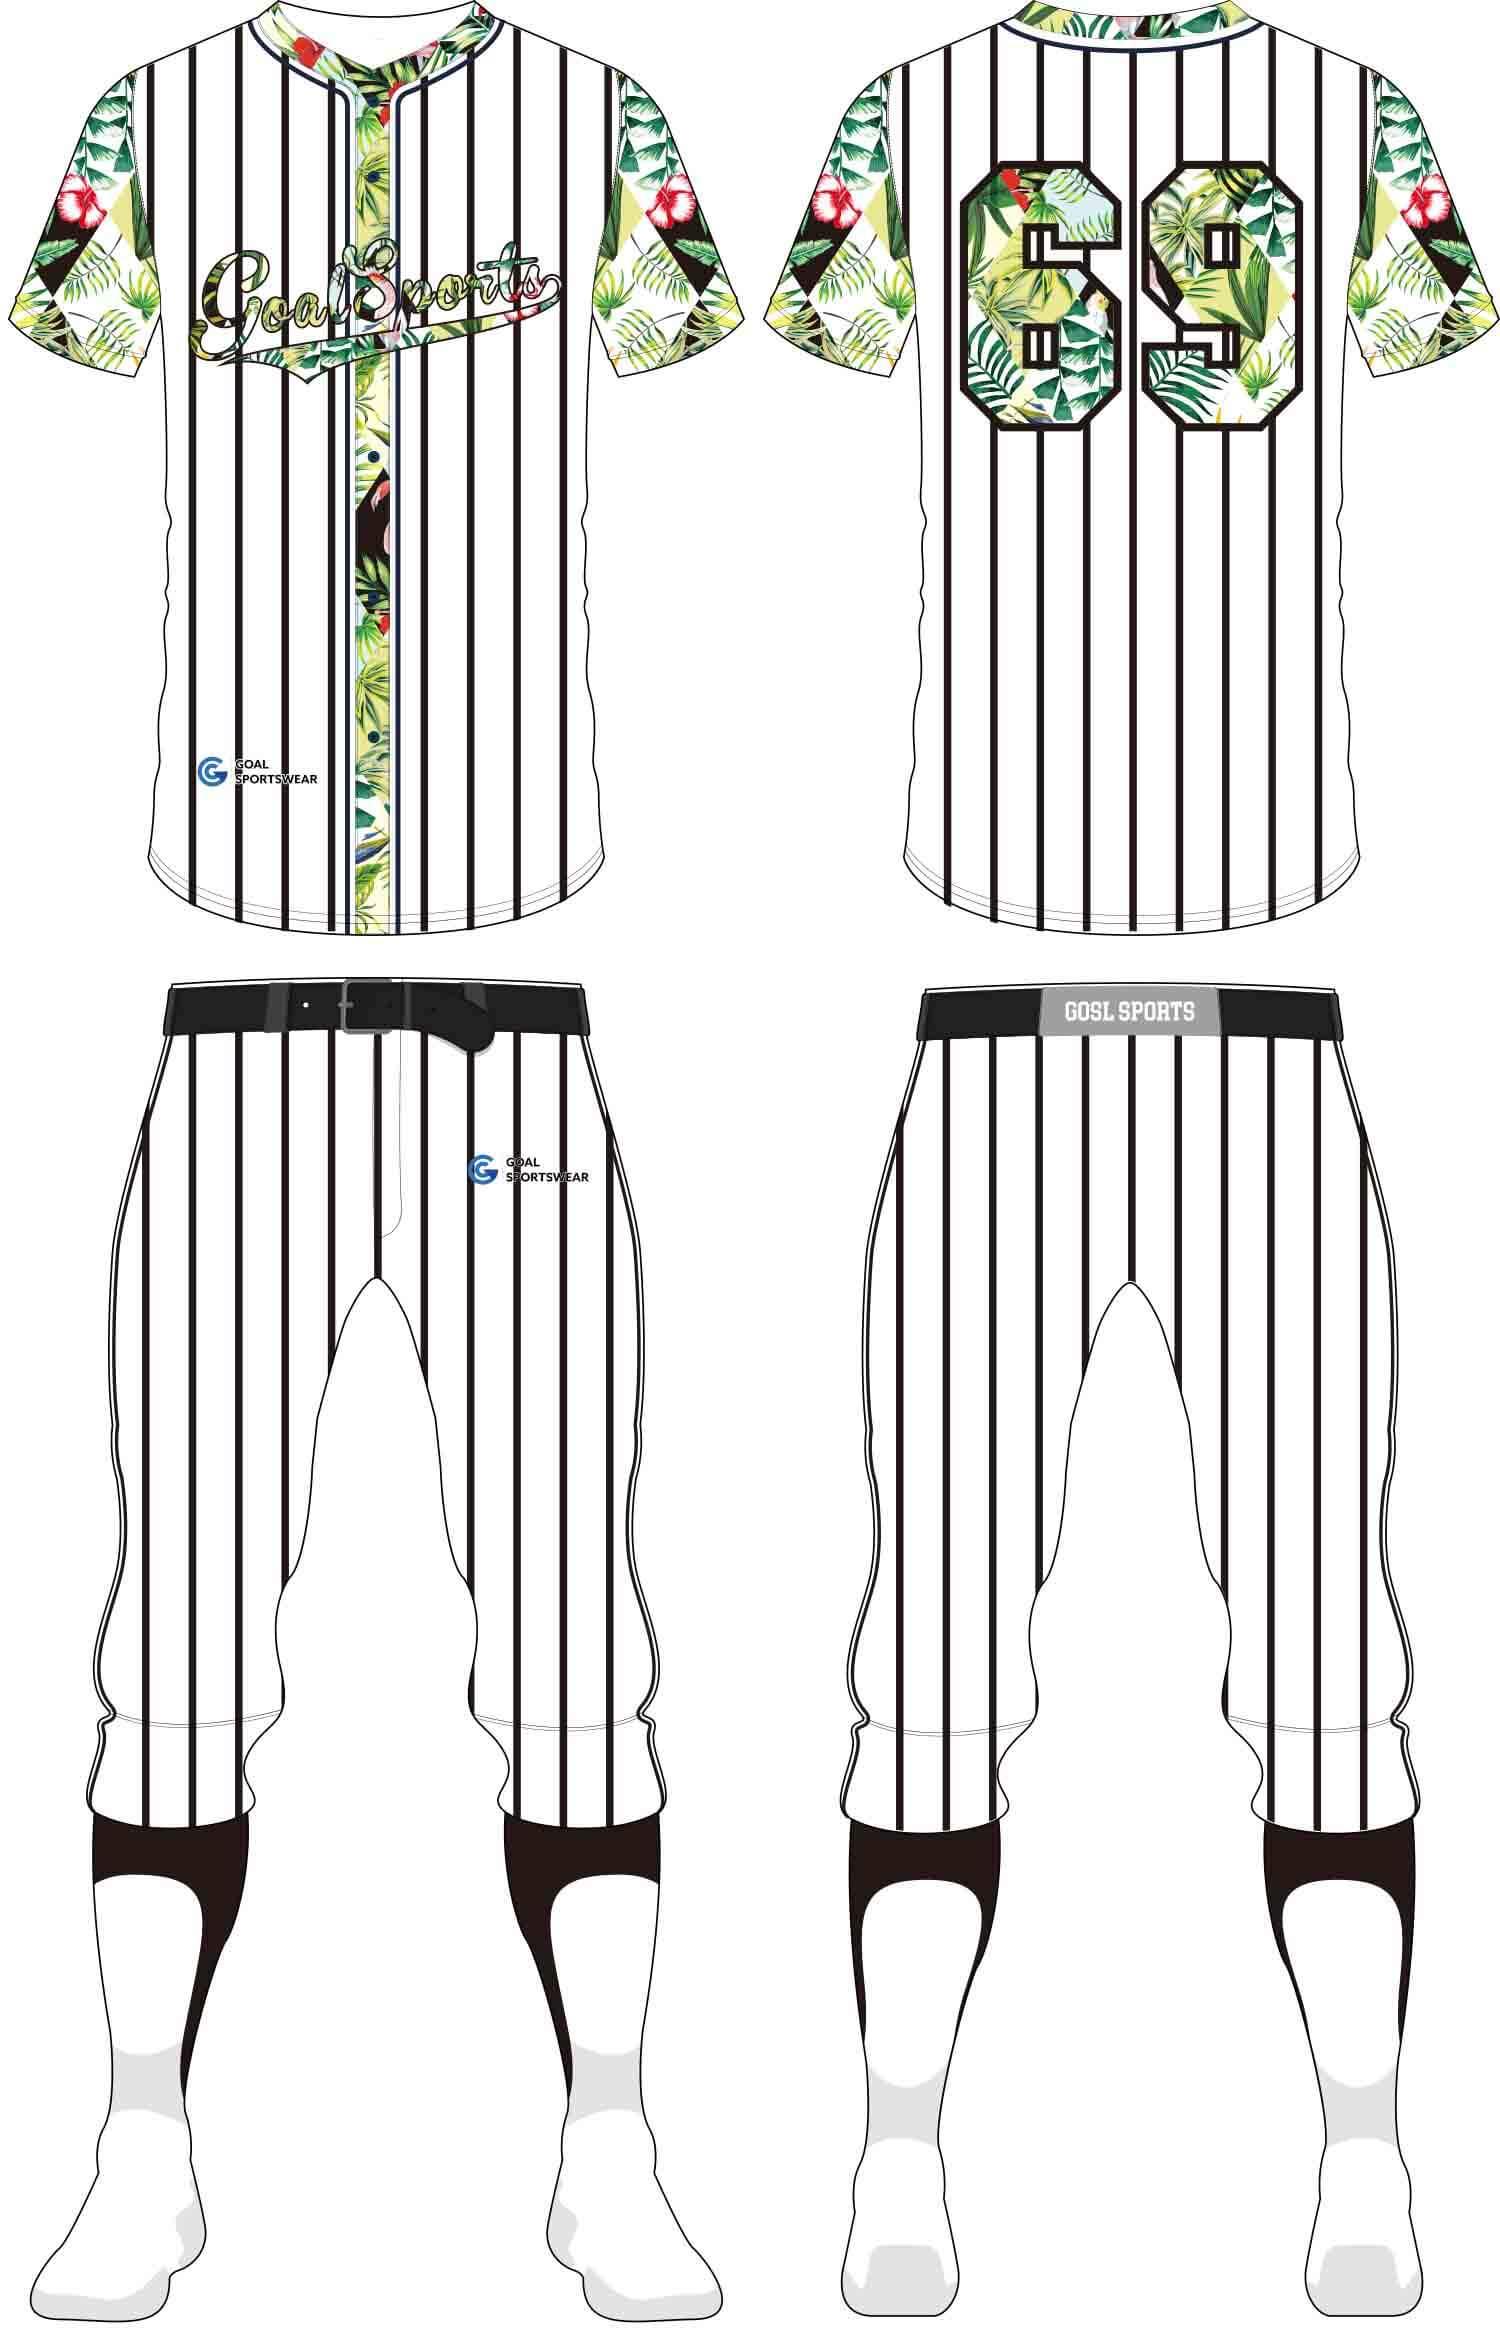 Custom wholesale sublimated printed Custom Youth Softball Uniforms